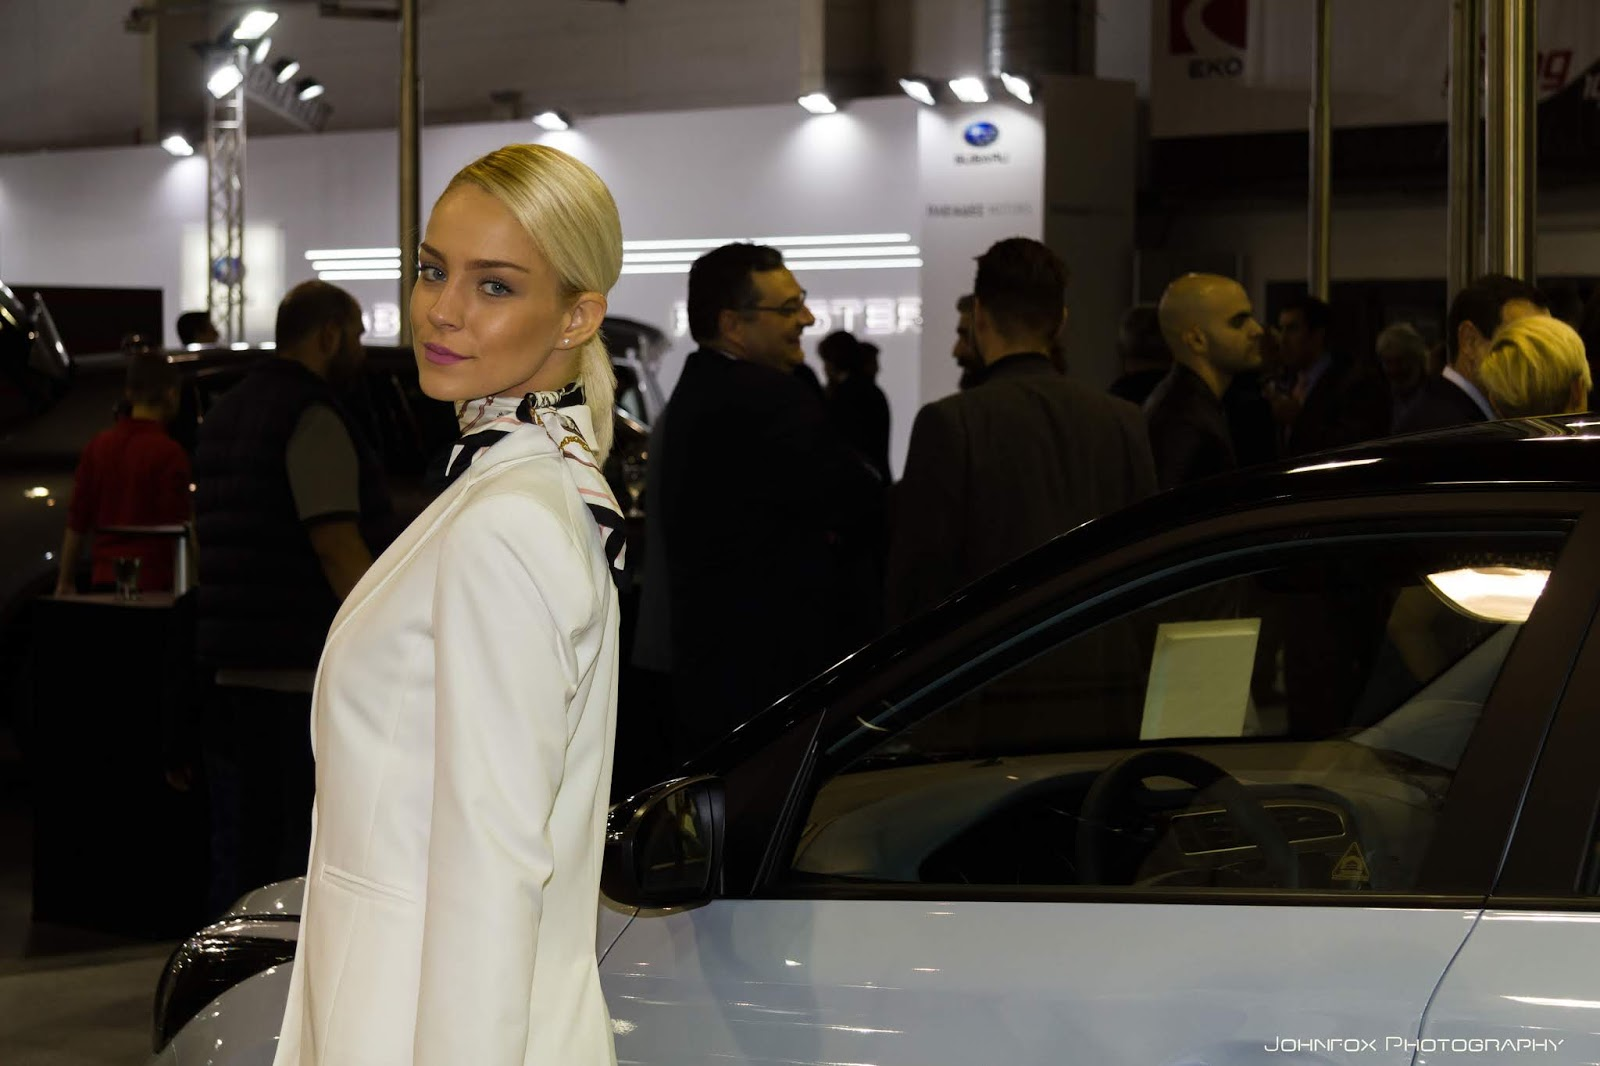 models2B2528202Bof2B232529 Τα κορίτσια της Αυτοκίνησης! Έκθεση, μοντέλα, ΦΩΤΟ, φωτογραφίες